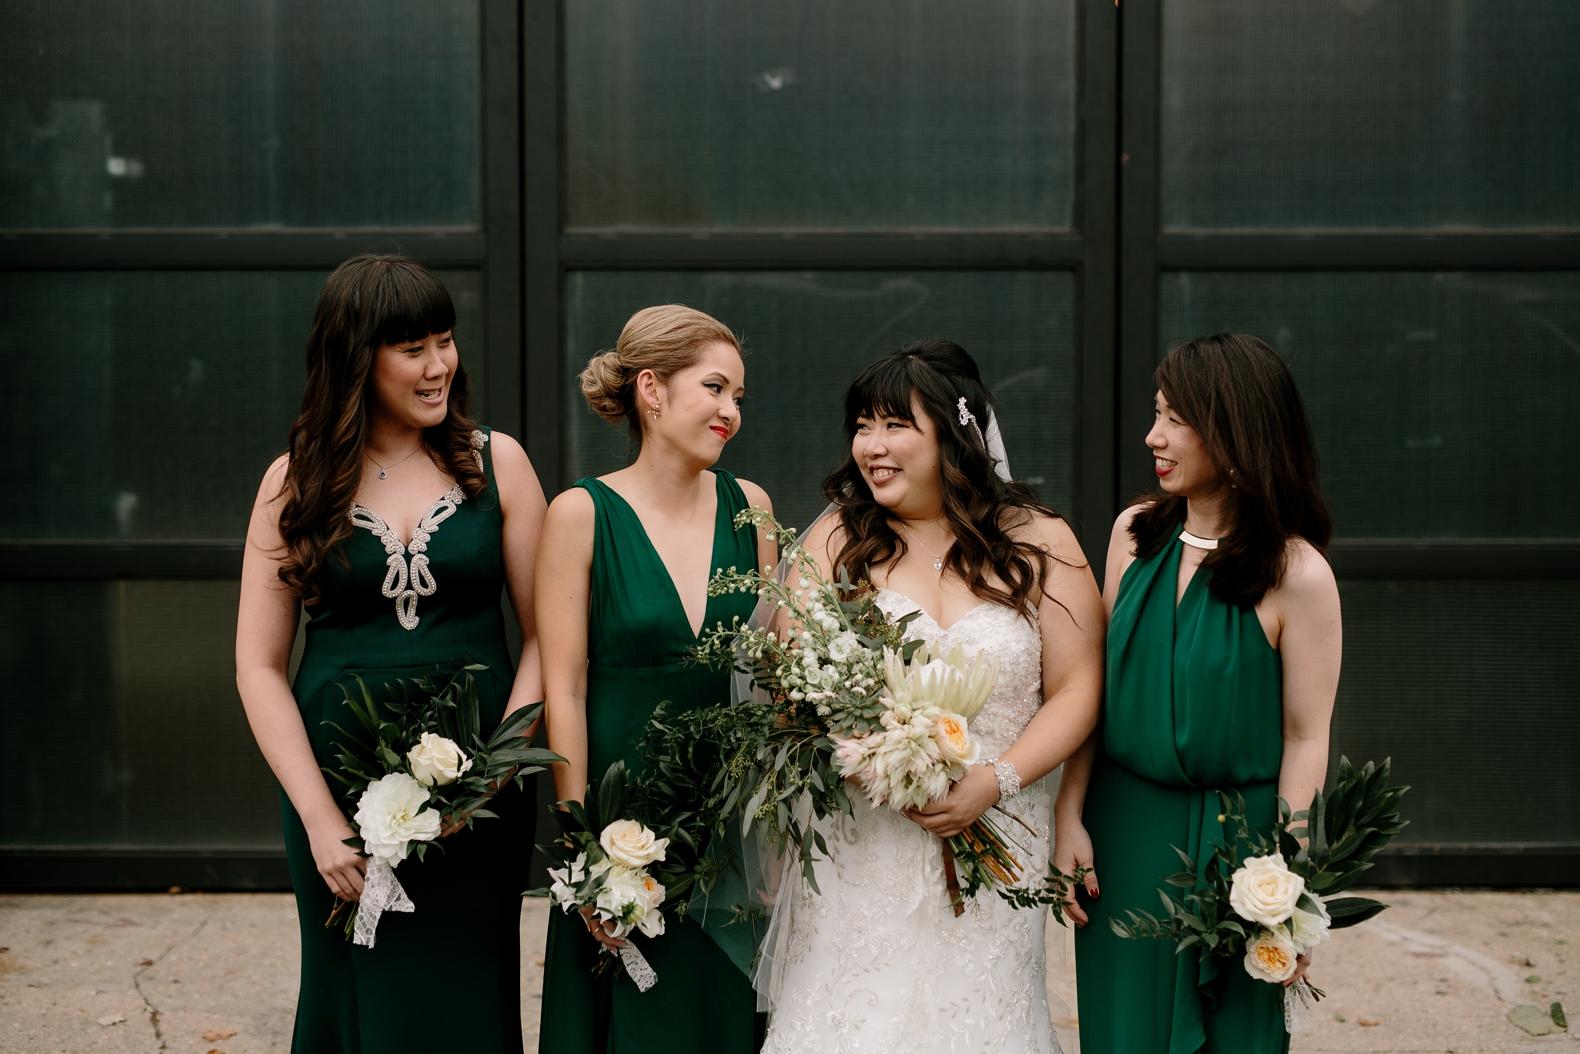 501-union-wedding-0057